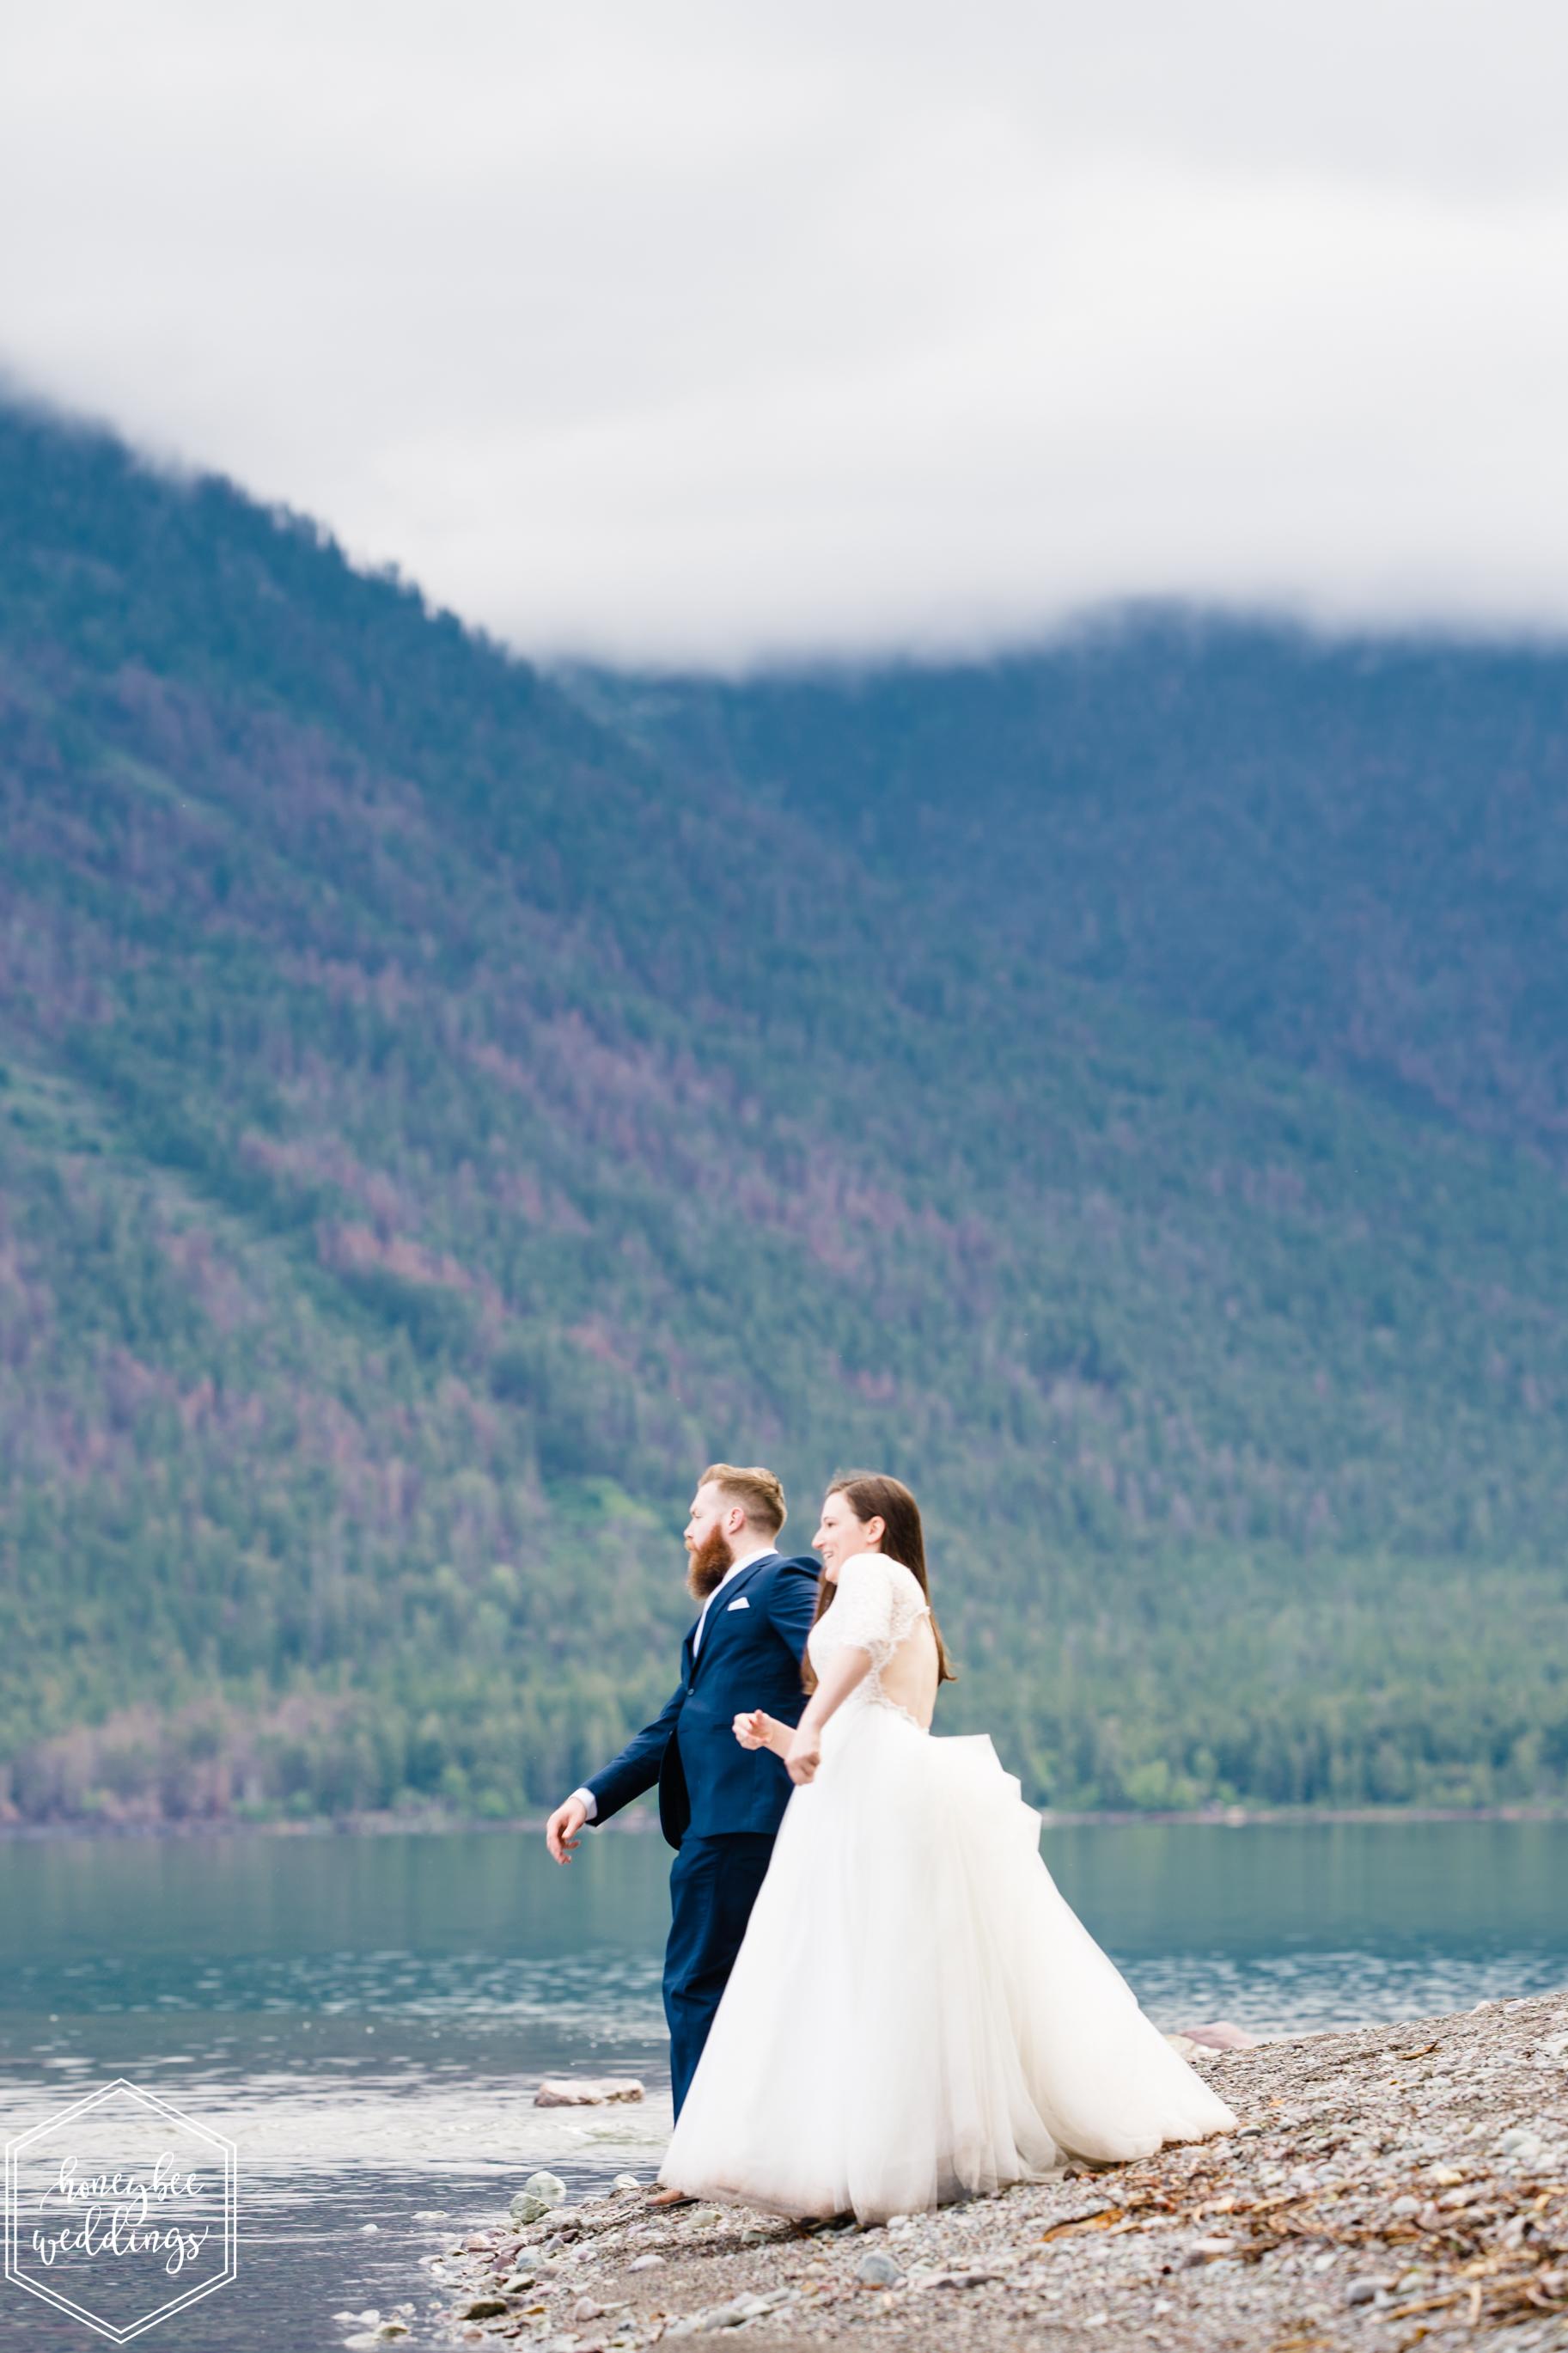 282Glacier National Park Wedding_Izaak Walton Inn Wedding_Honeybee Weddings_Norah & Kyle_June 09, 2019-106.jpg